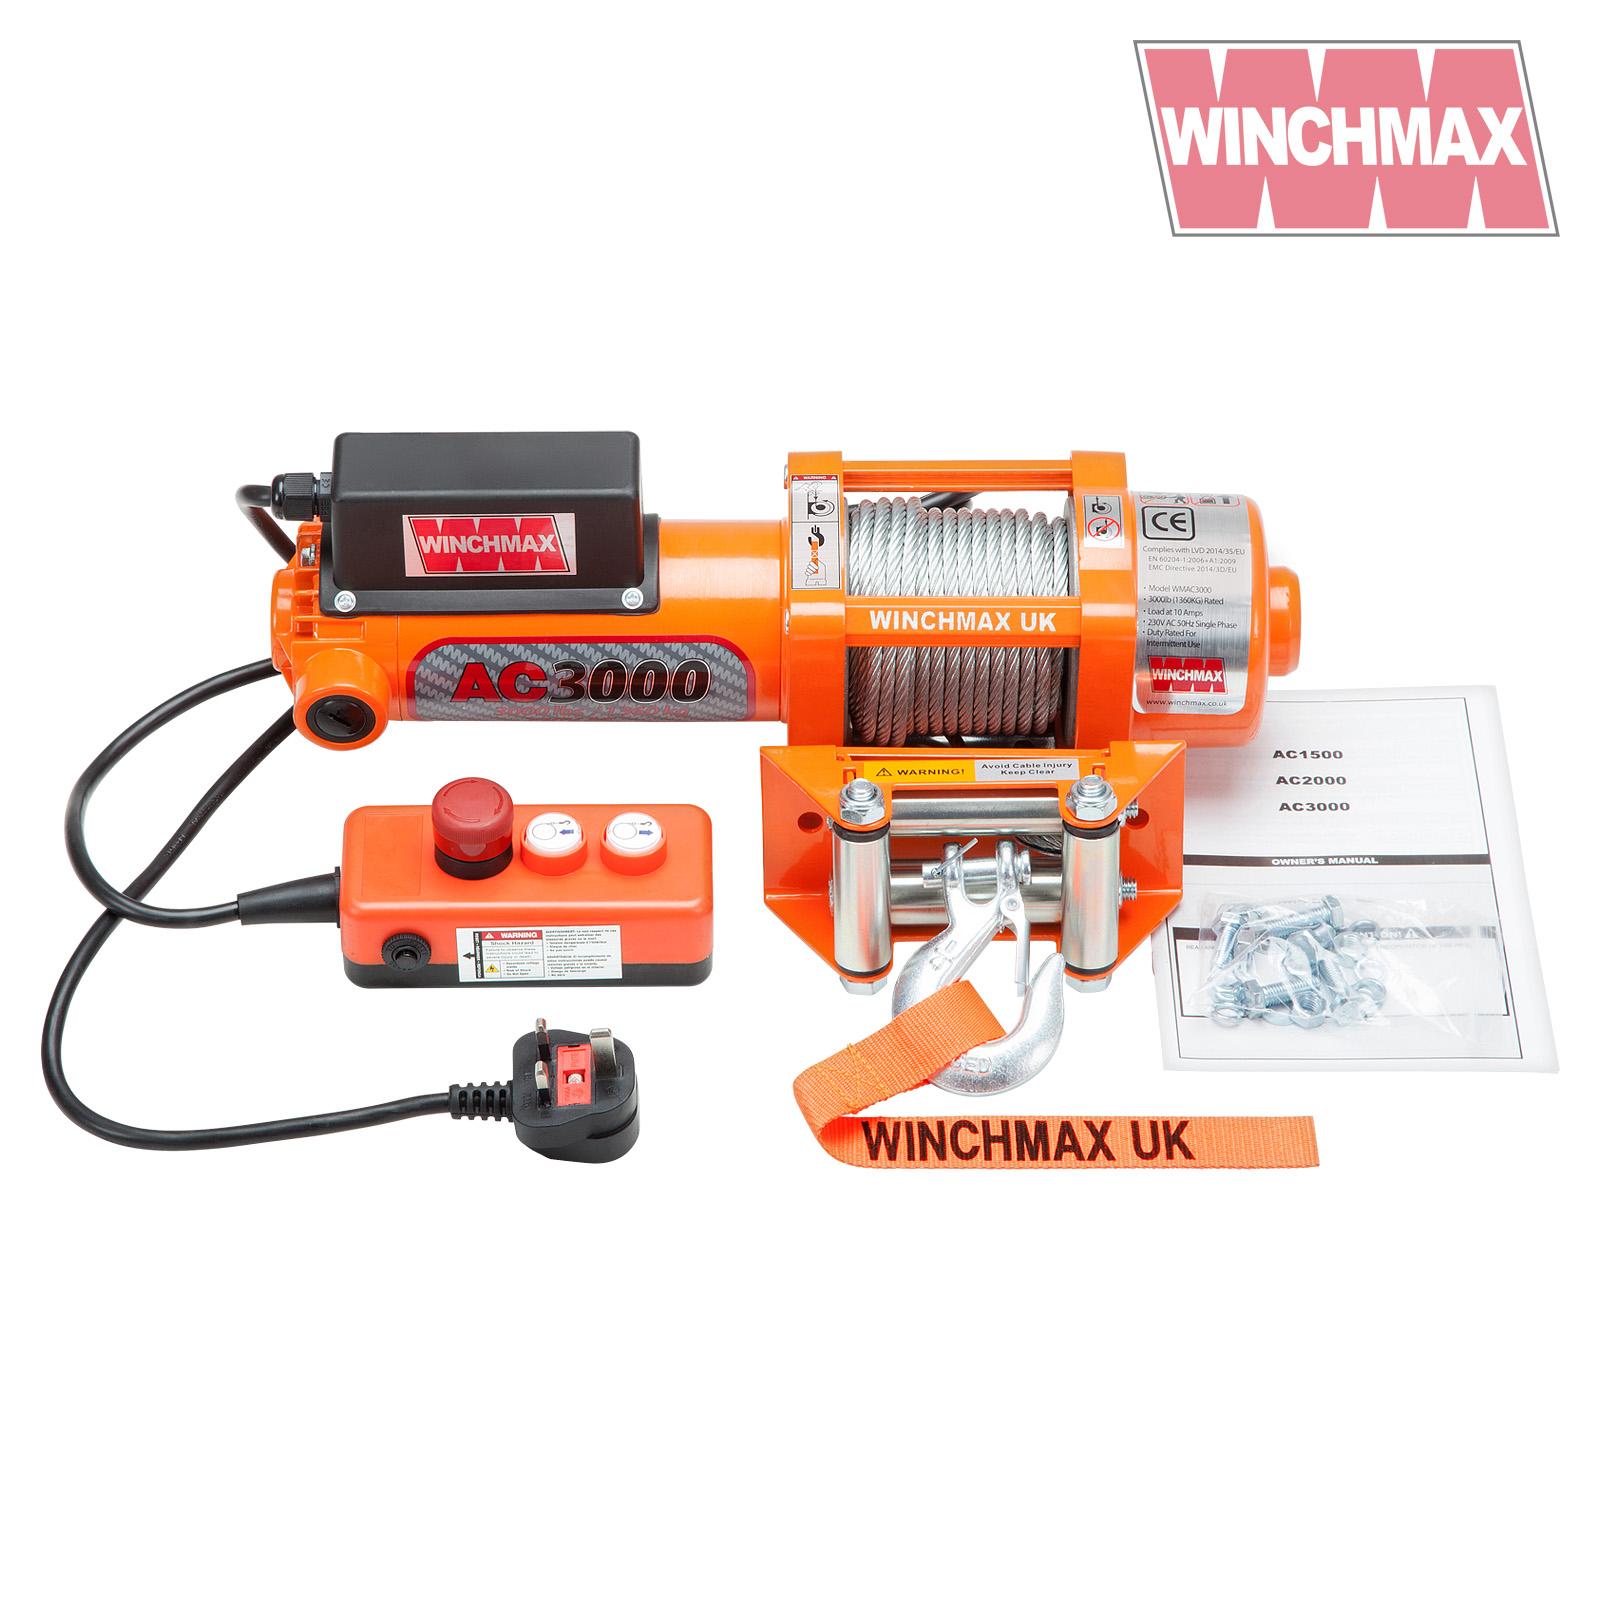 Wmac3000 winchmax 208